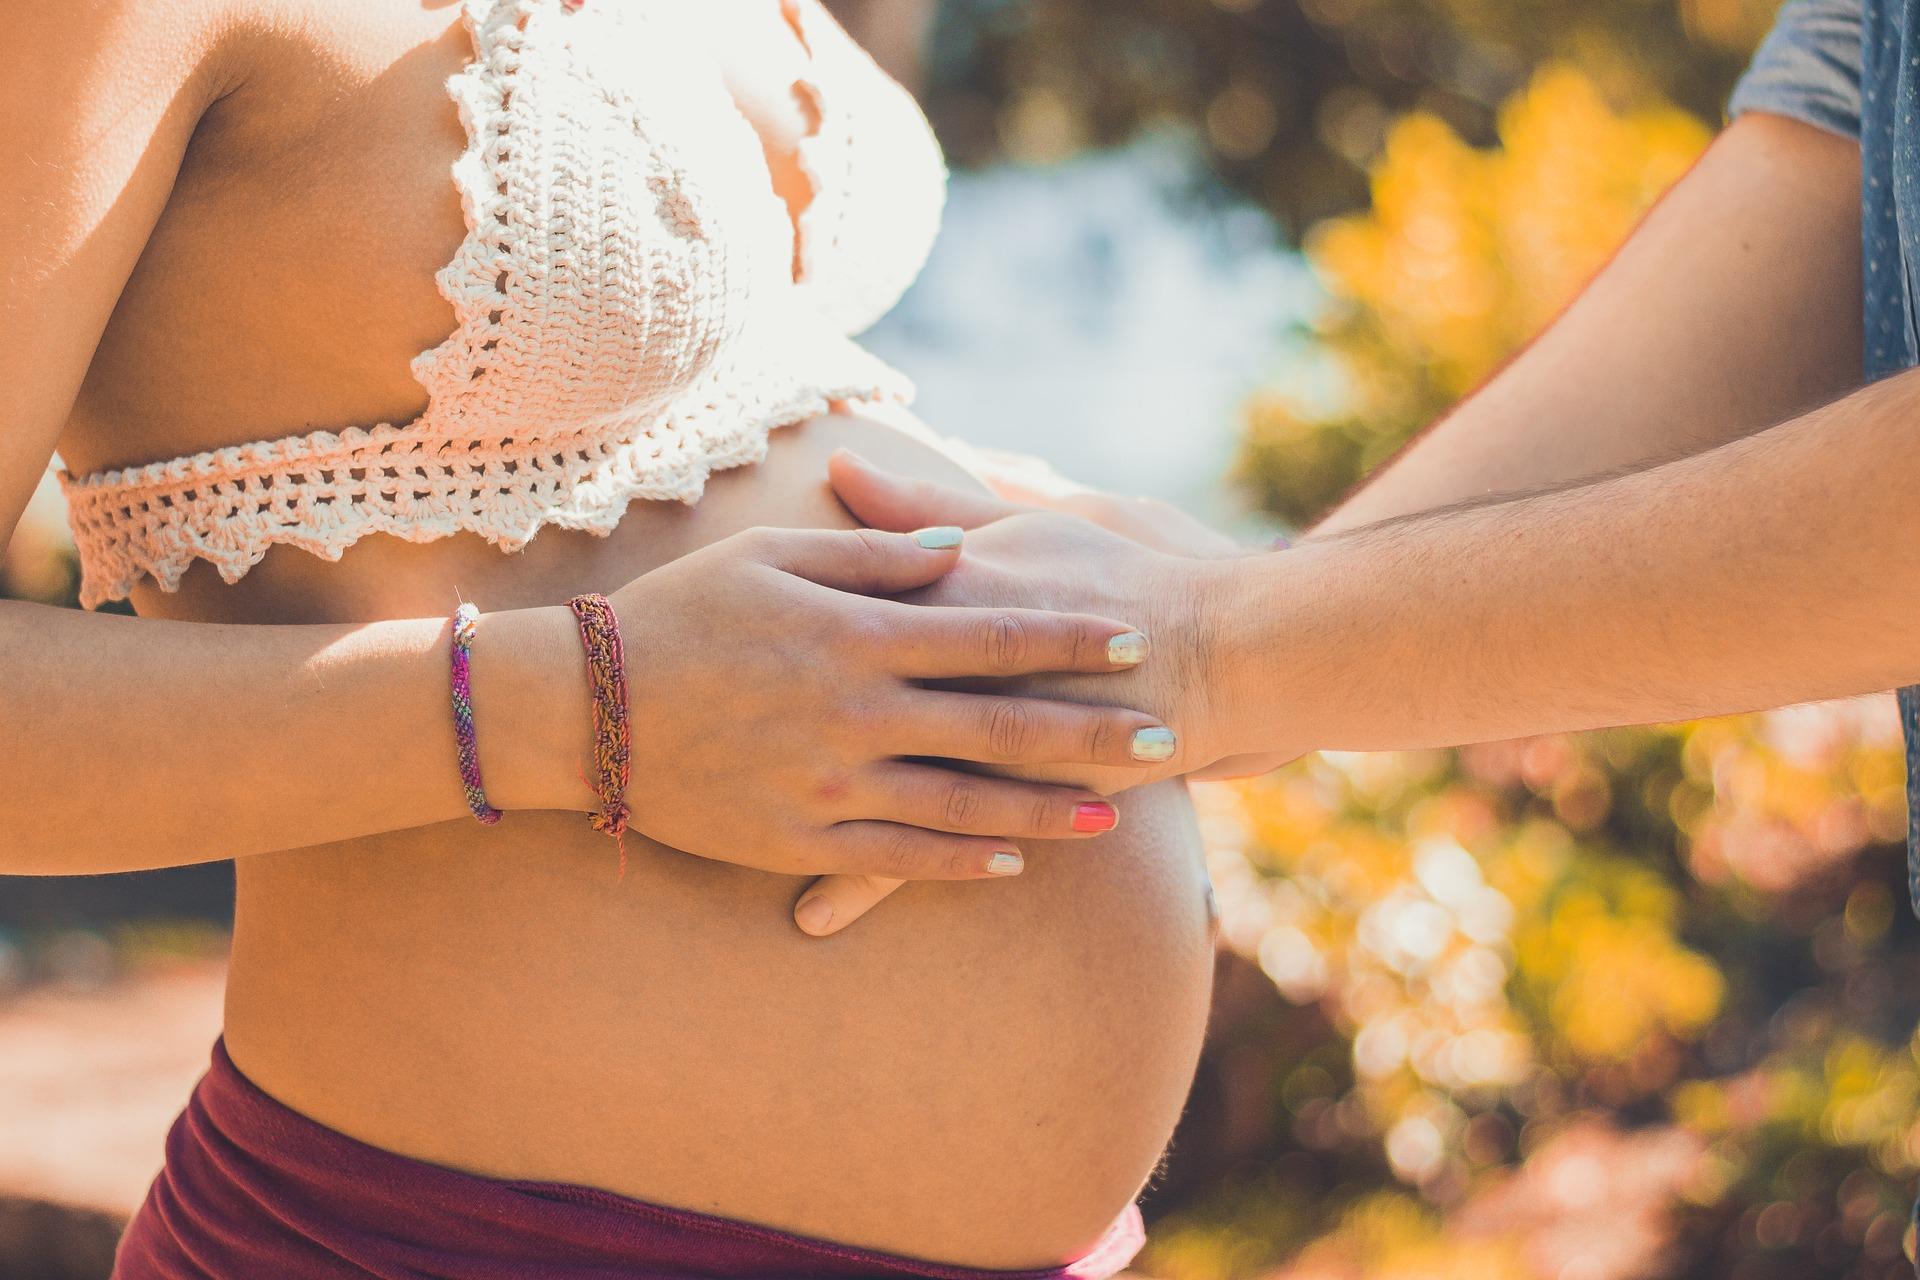 Terhességi vitaminok: Vas és C-vitamin